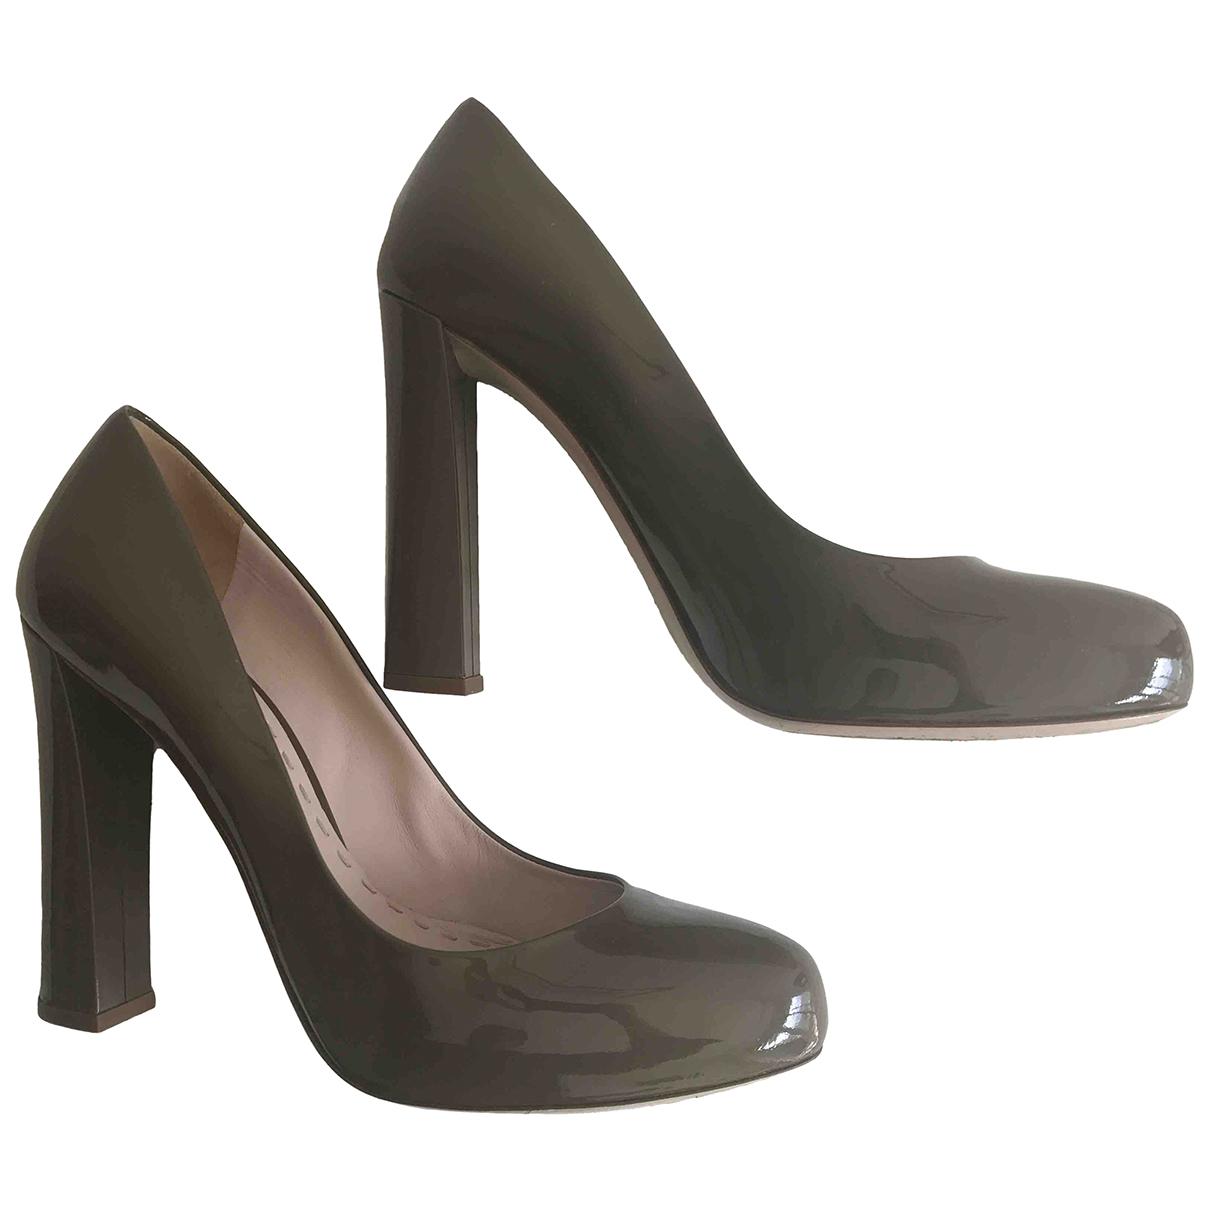 Miu Miu \N Khaki Patent leather Heels for Women 40 EU